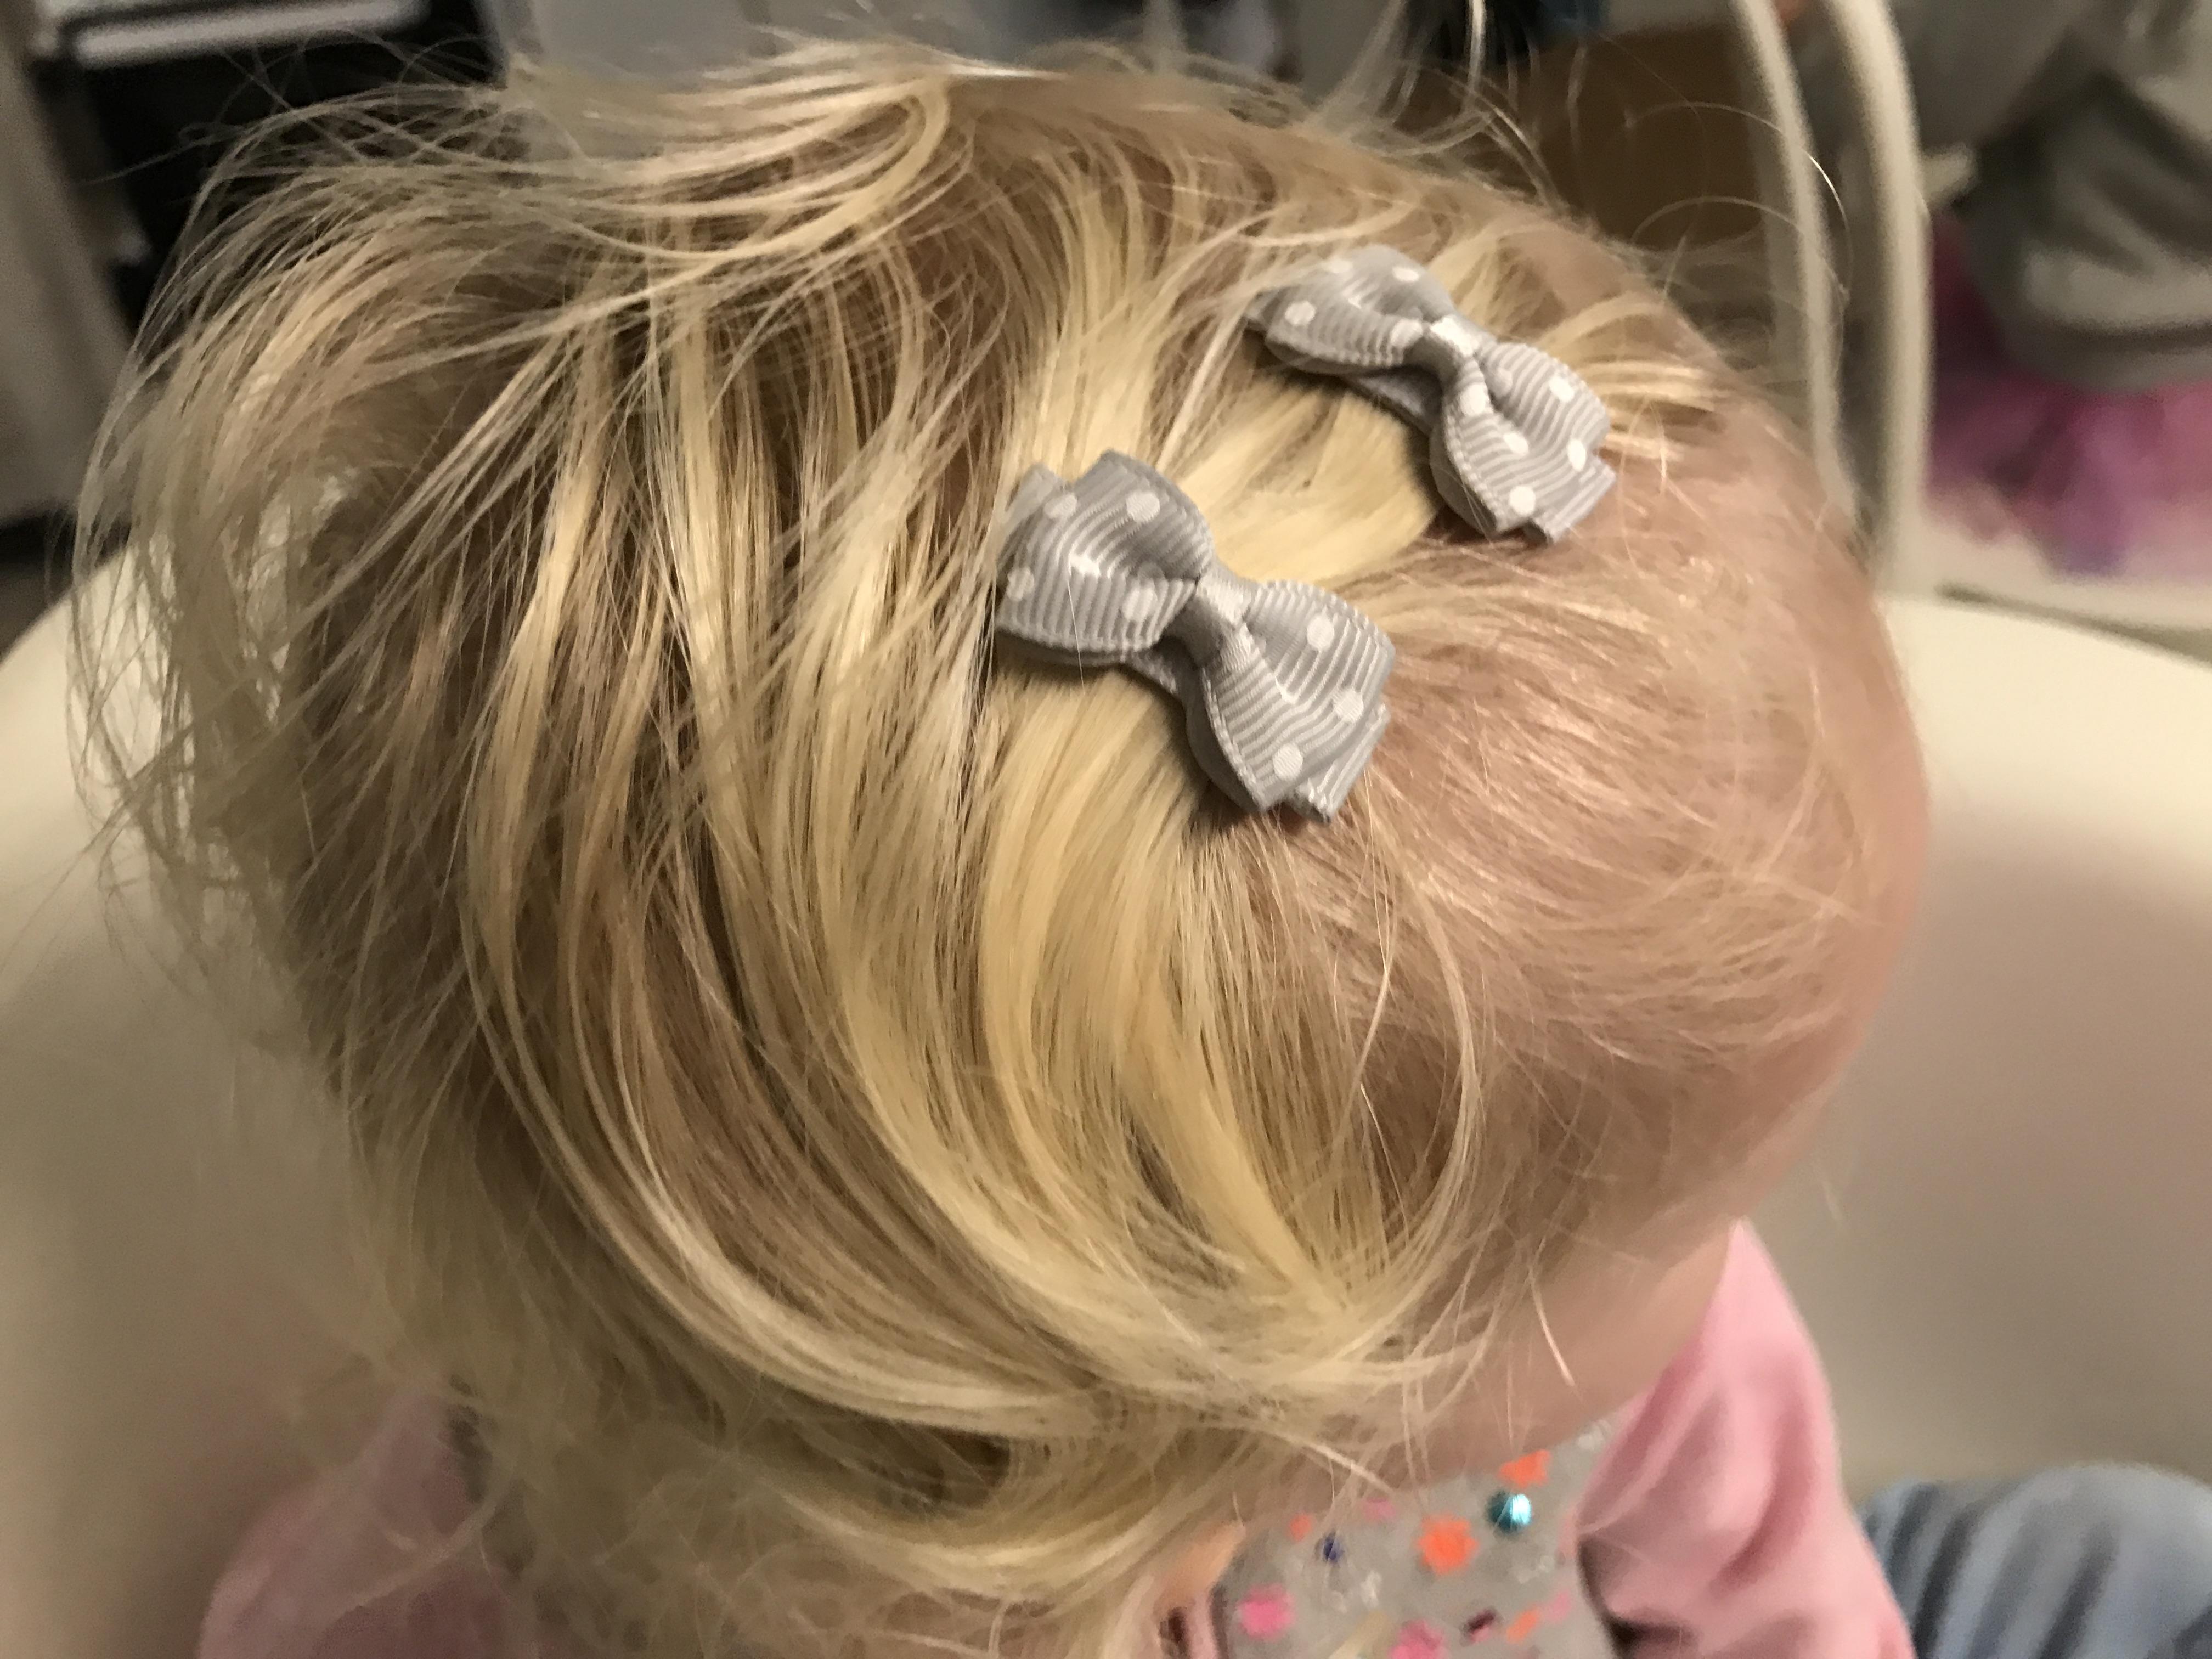 11-16-haarspeldjes-sinterklaas-kerst-cadeau-meisje-leuk-verpakt-verpakking-mooi-strikjes-klipjes-baby-tip-cadeau-verpakt-klein